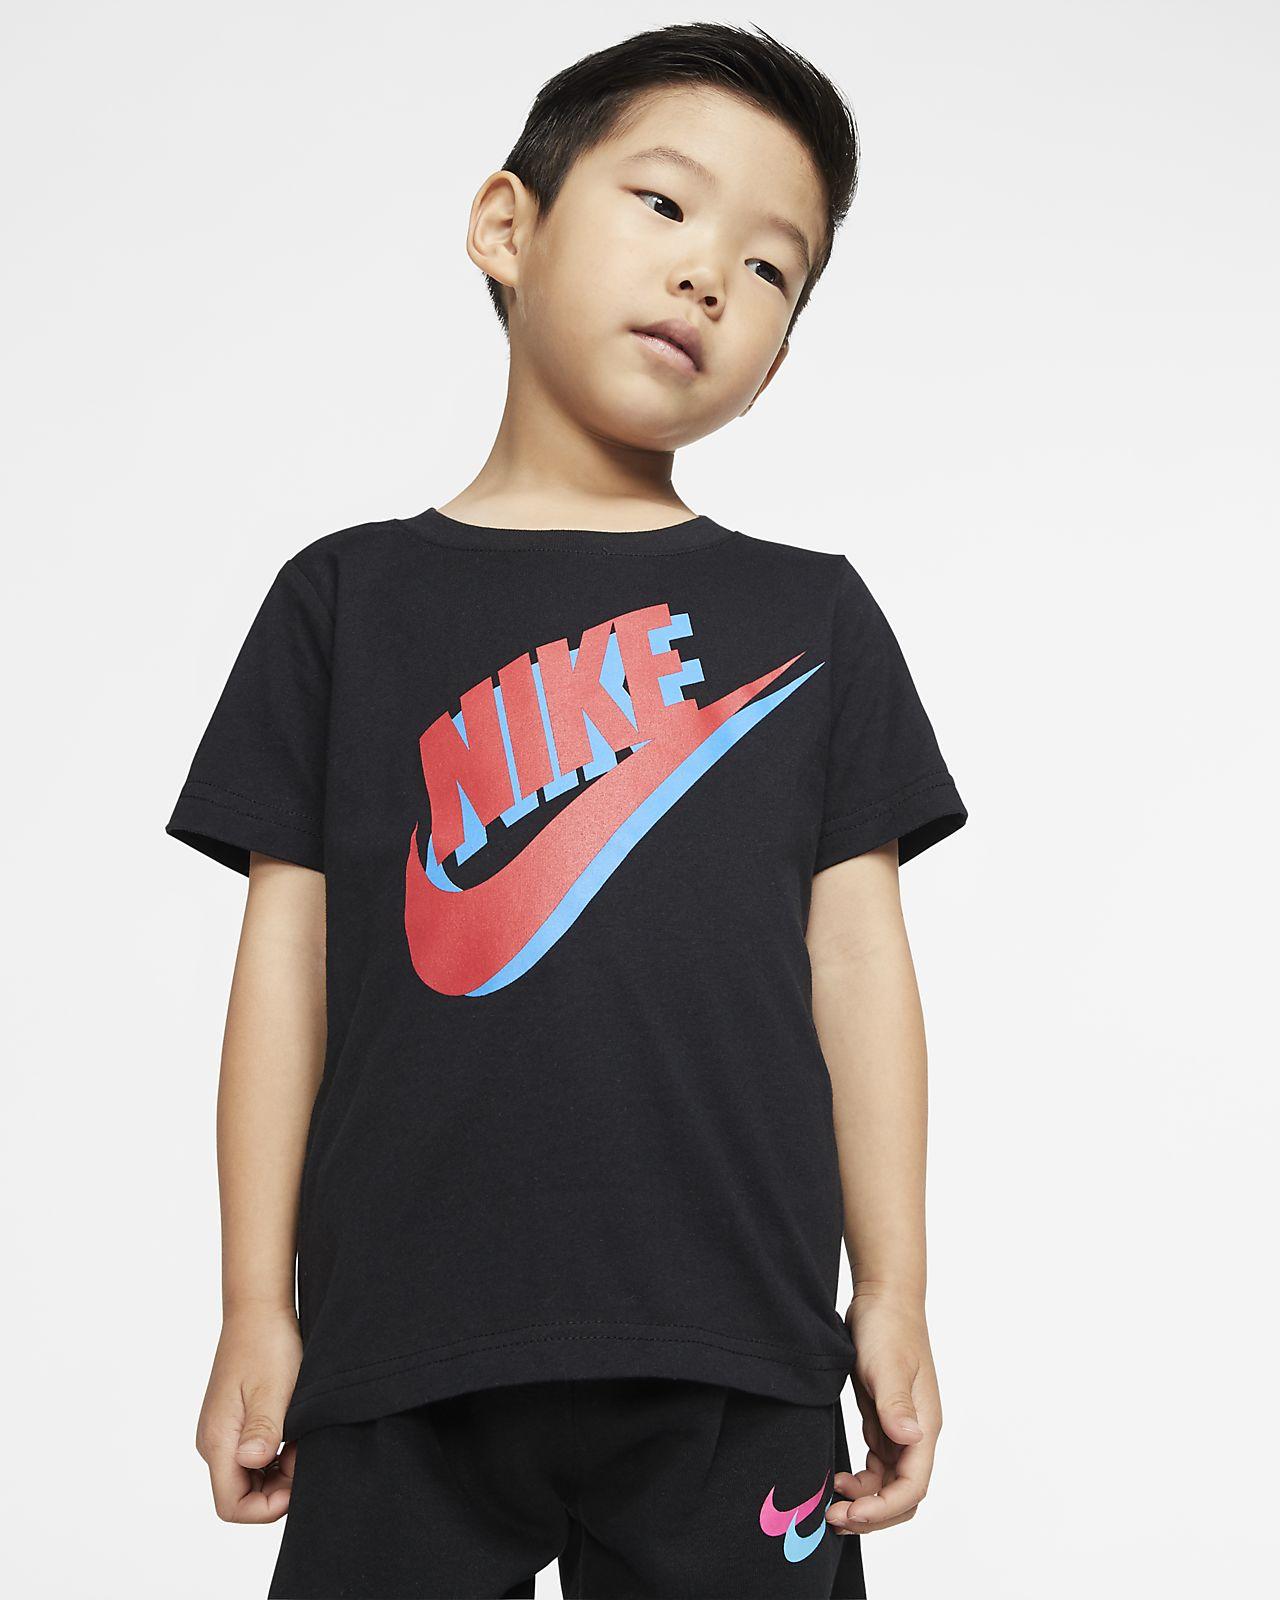 Nike Camiseta de manga corta Infantil